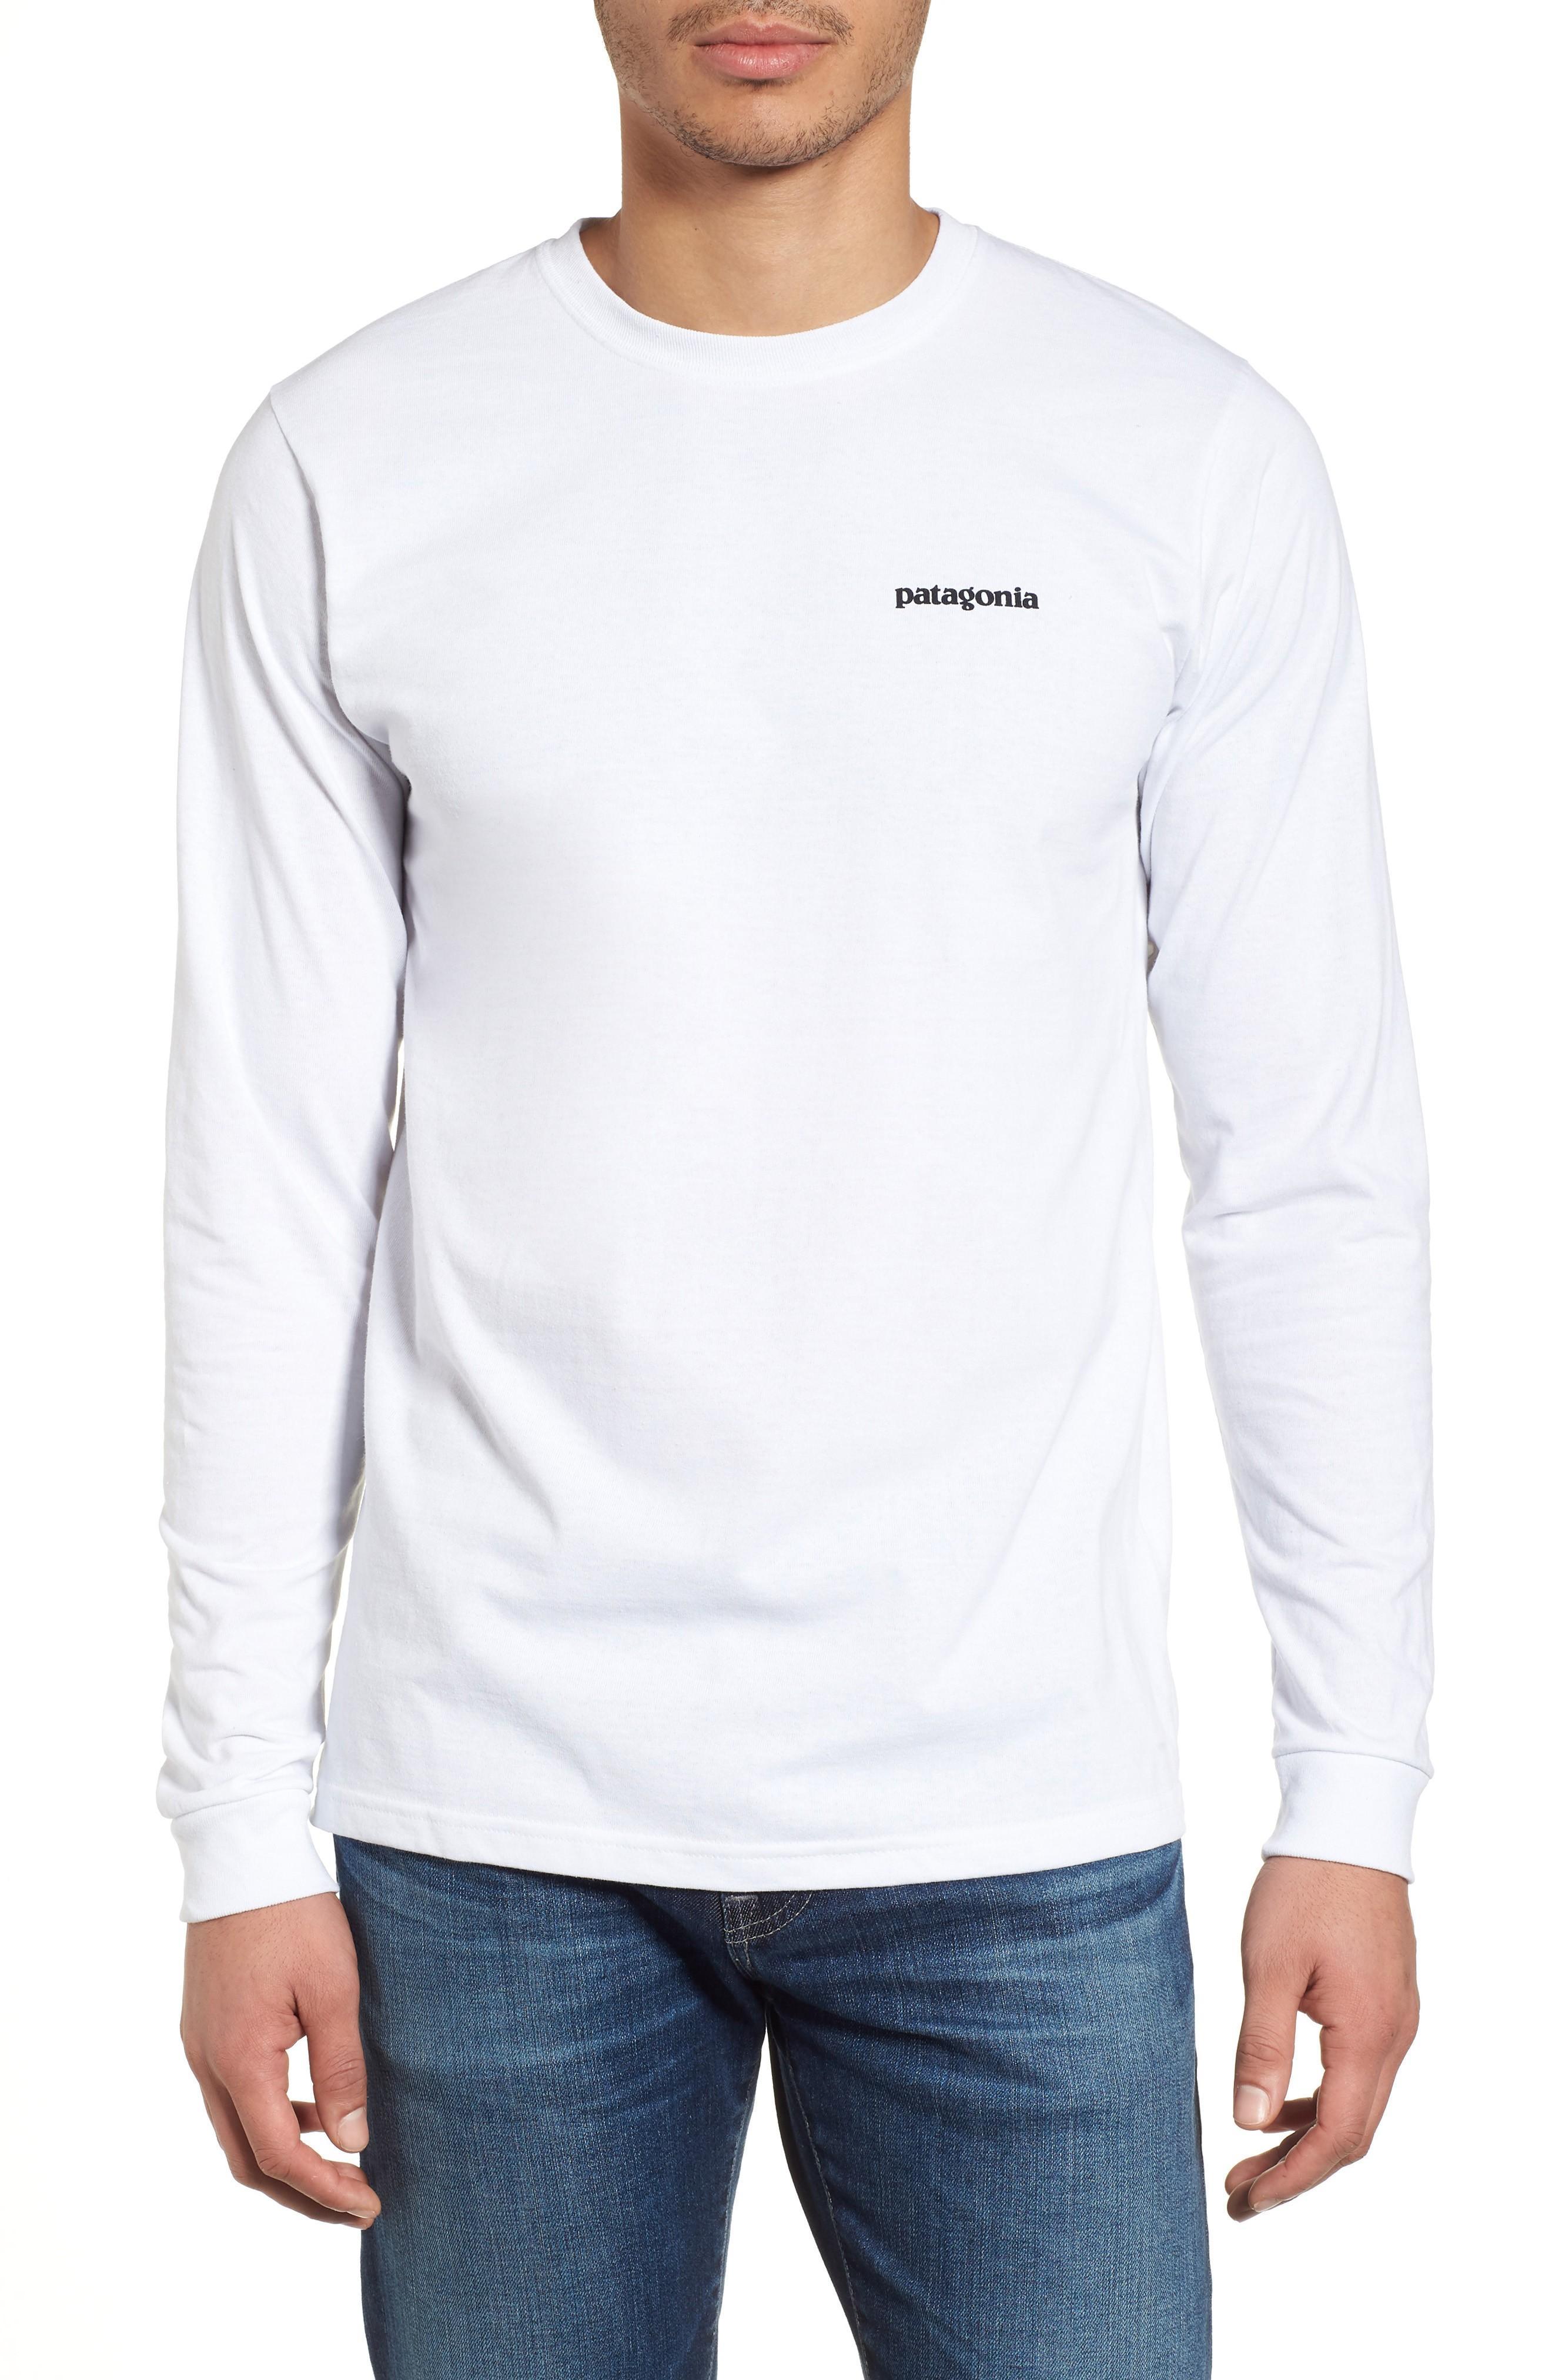 Patagonia Responsibili-Tee Long Sleeve T-Shirt In White